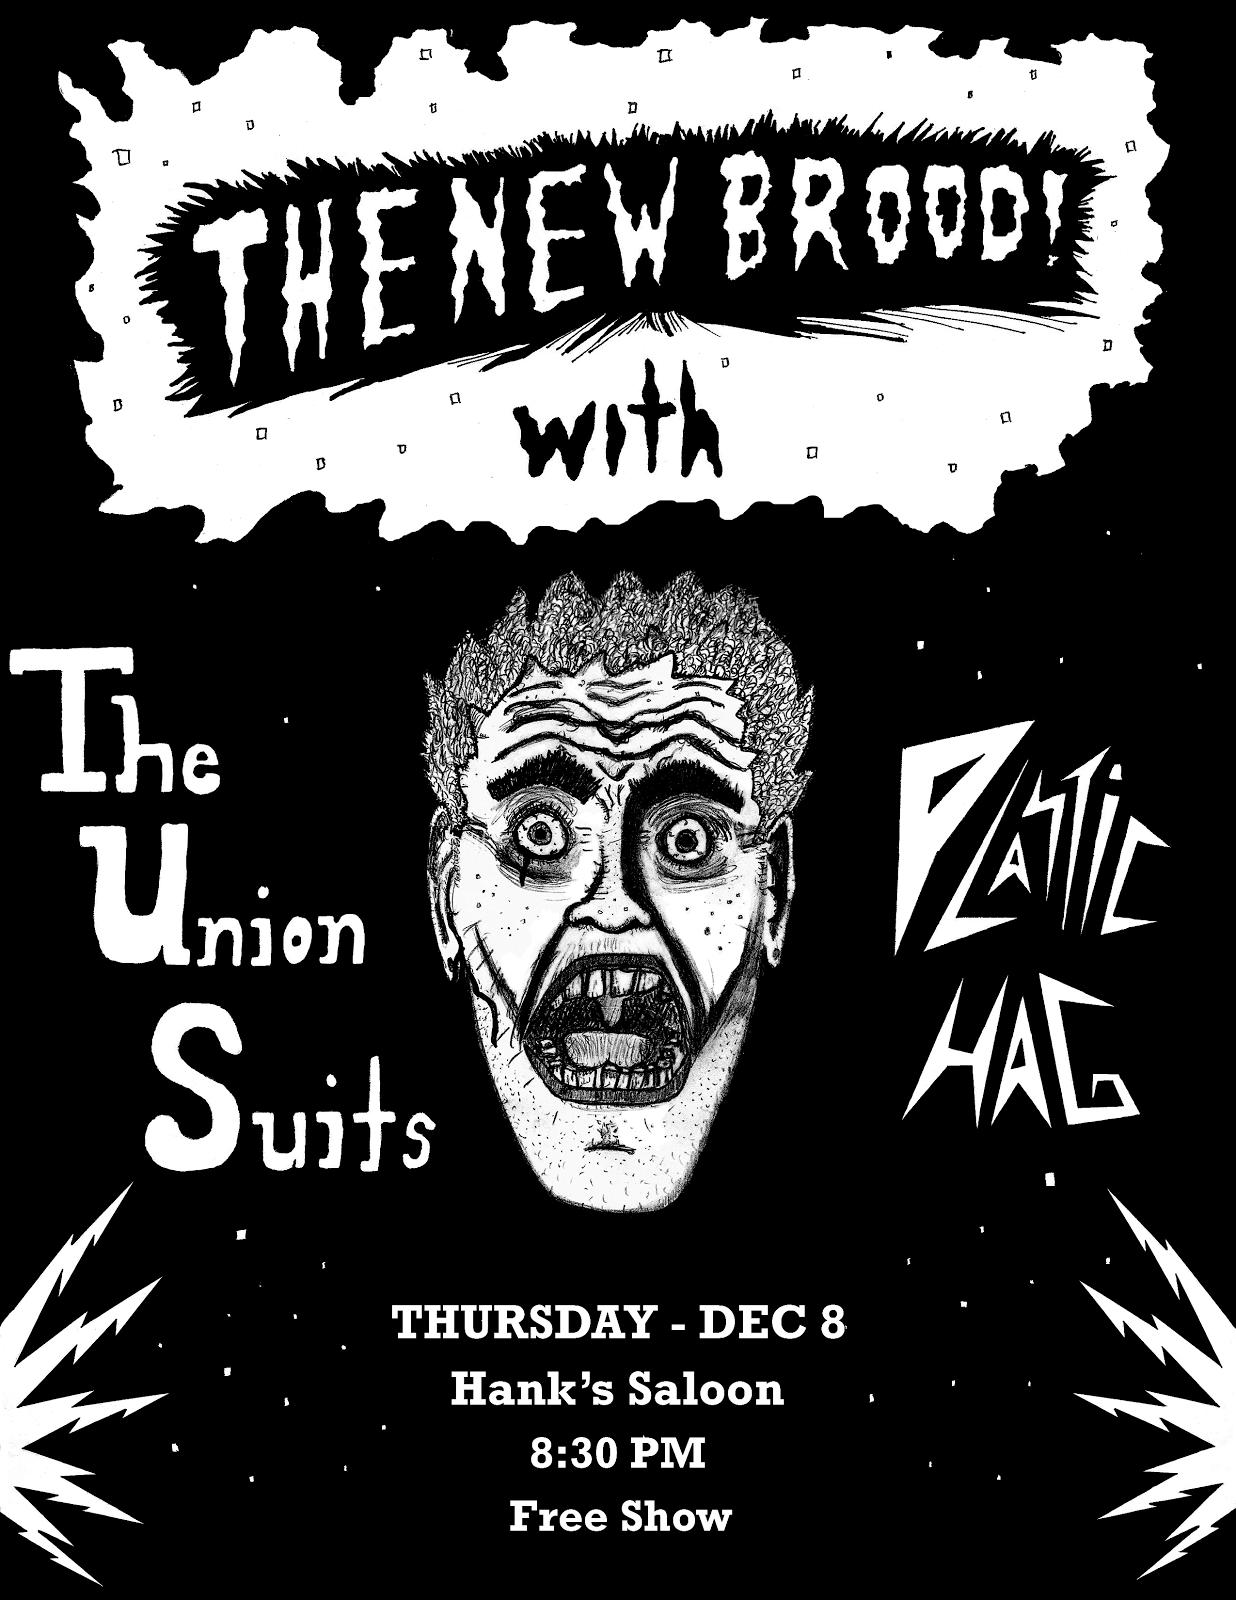 December 8th